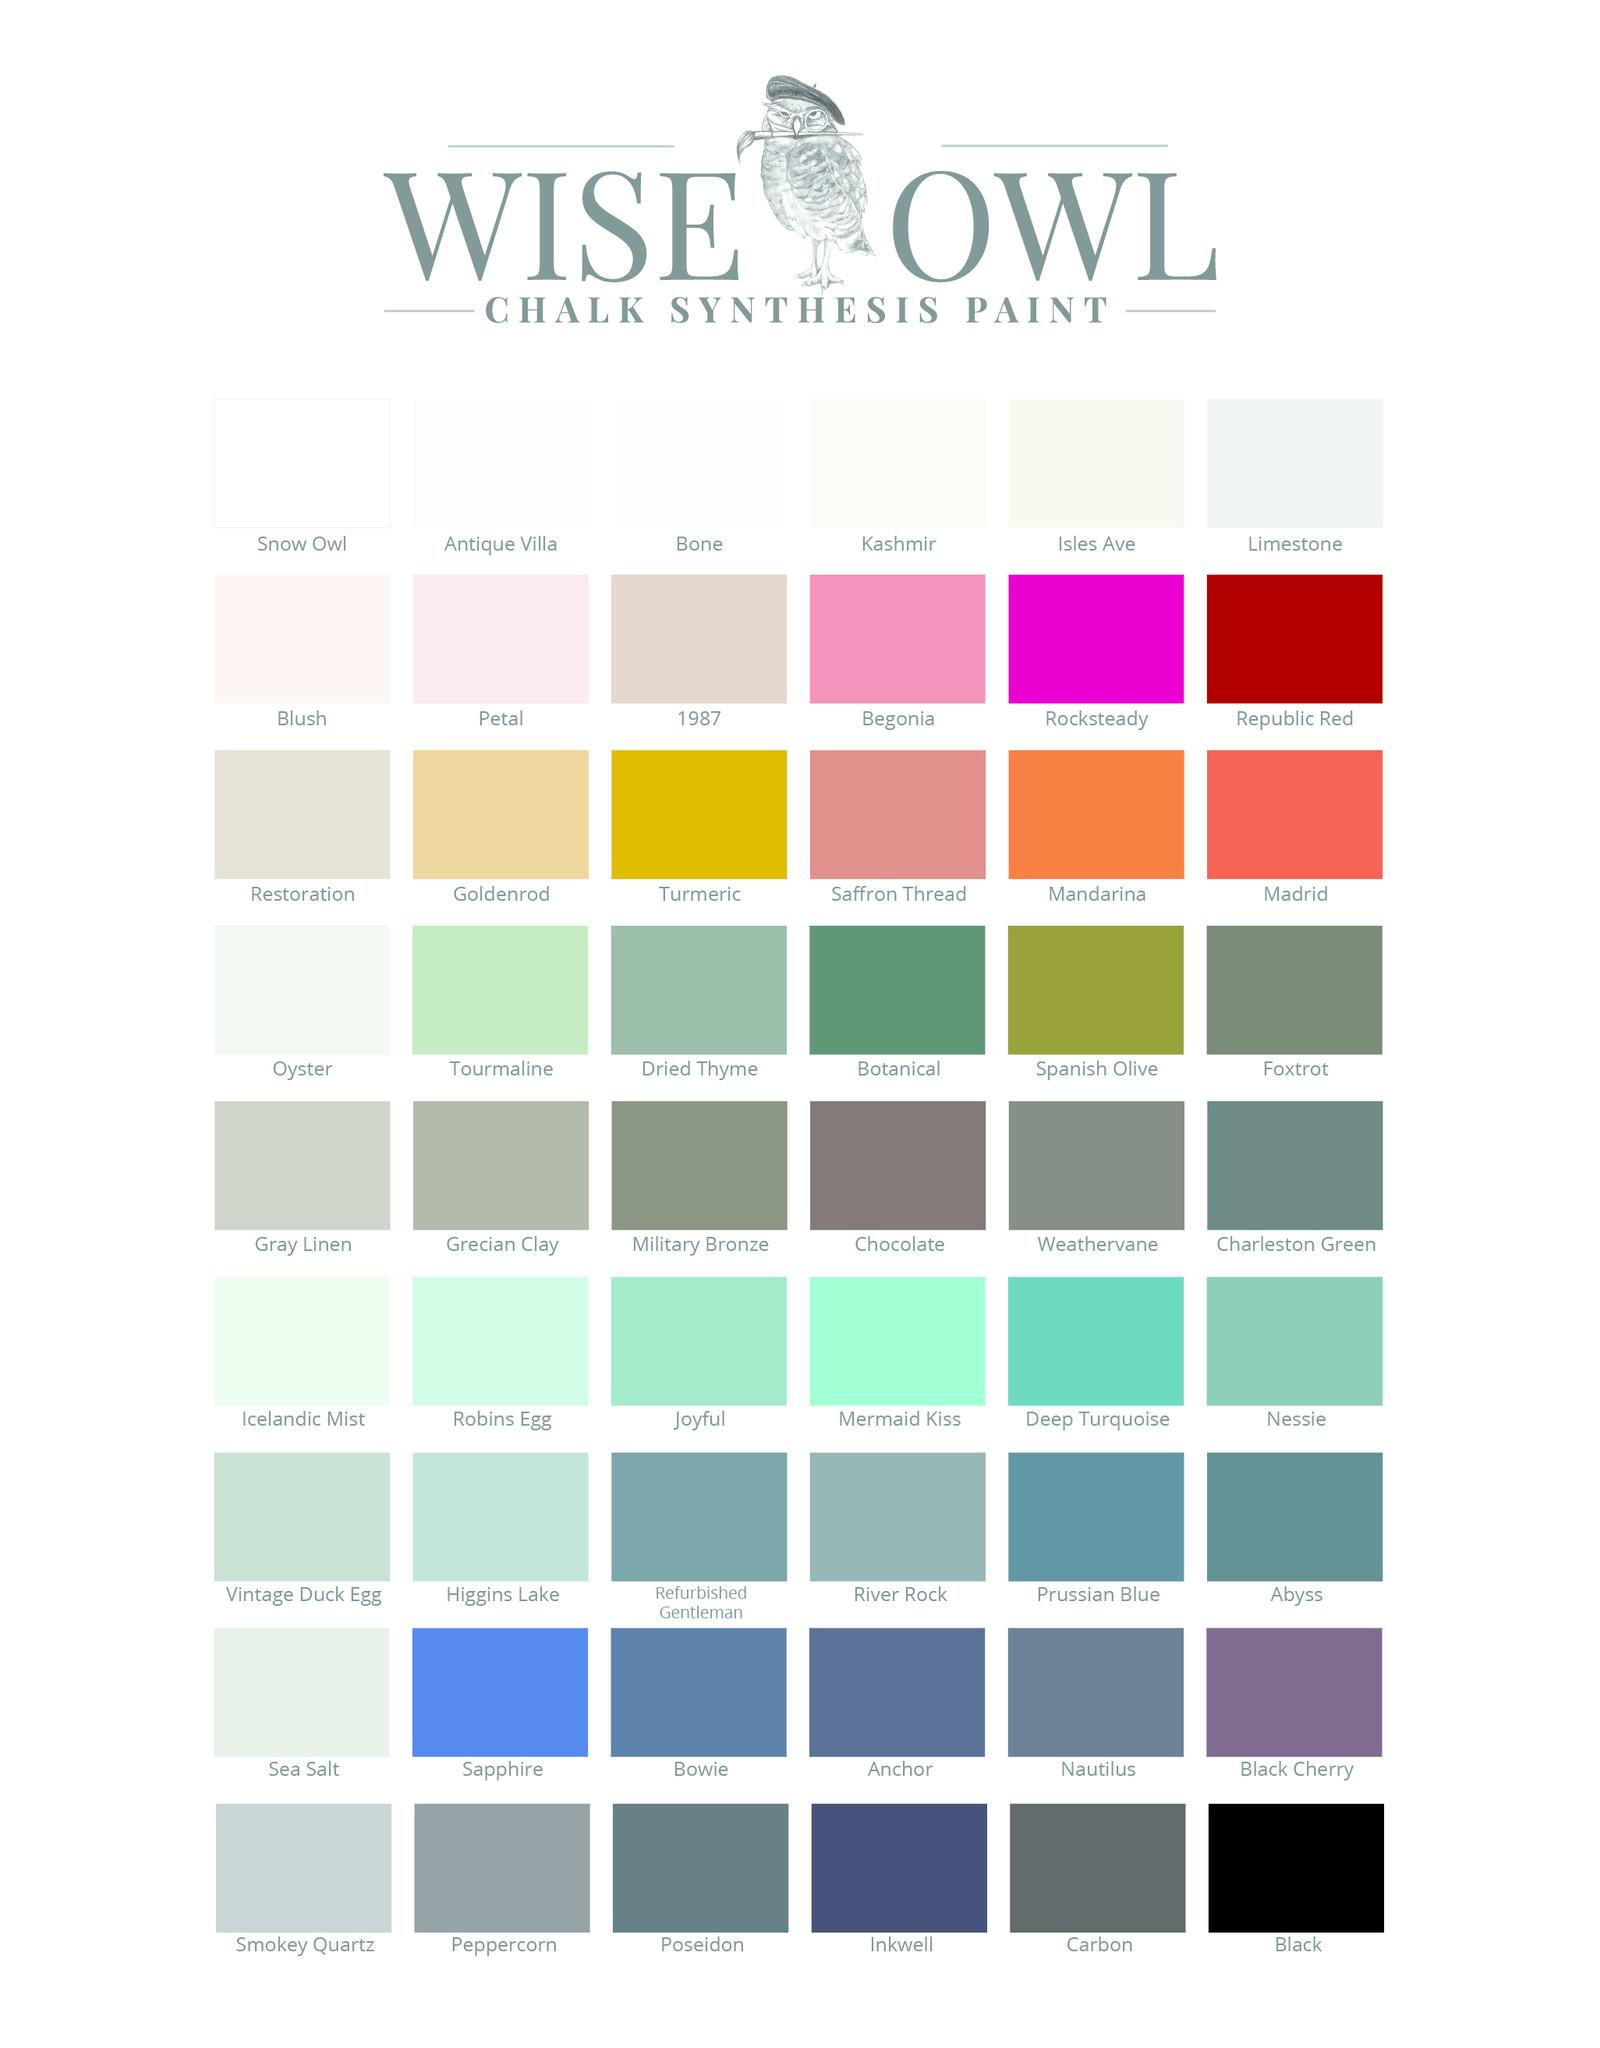 Wise Owl Paint Chalk Synthesis Paint Smokey Quartz-Pint